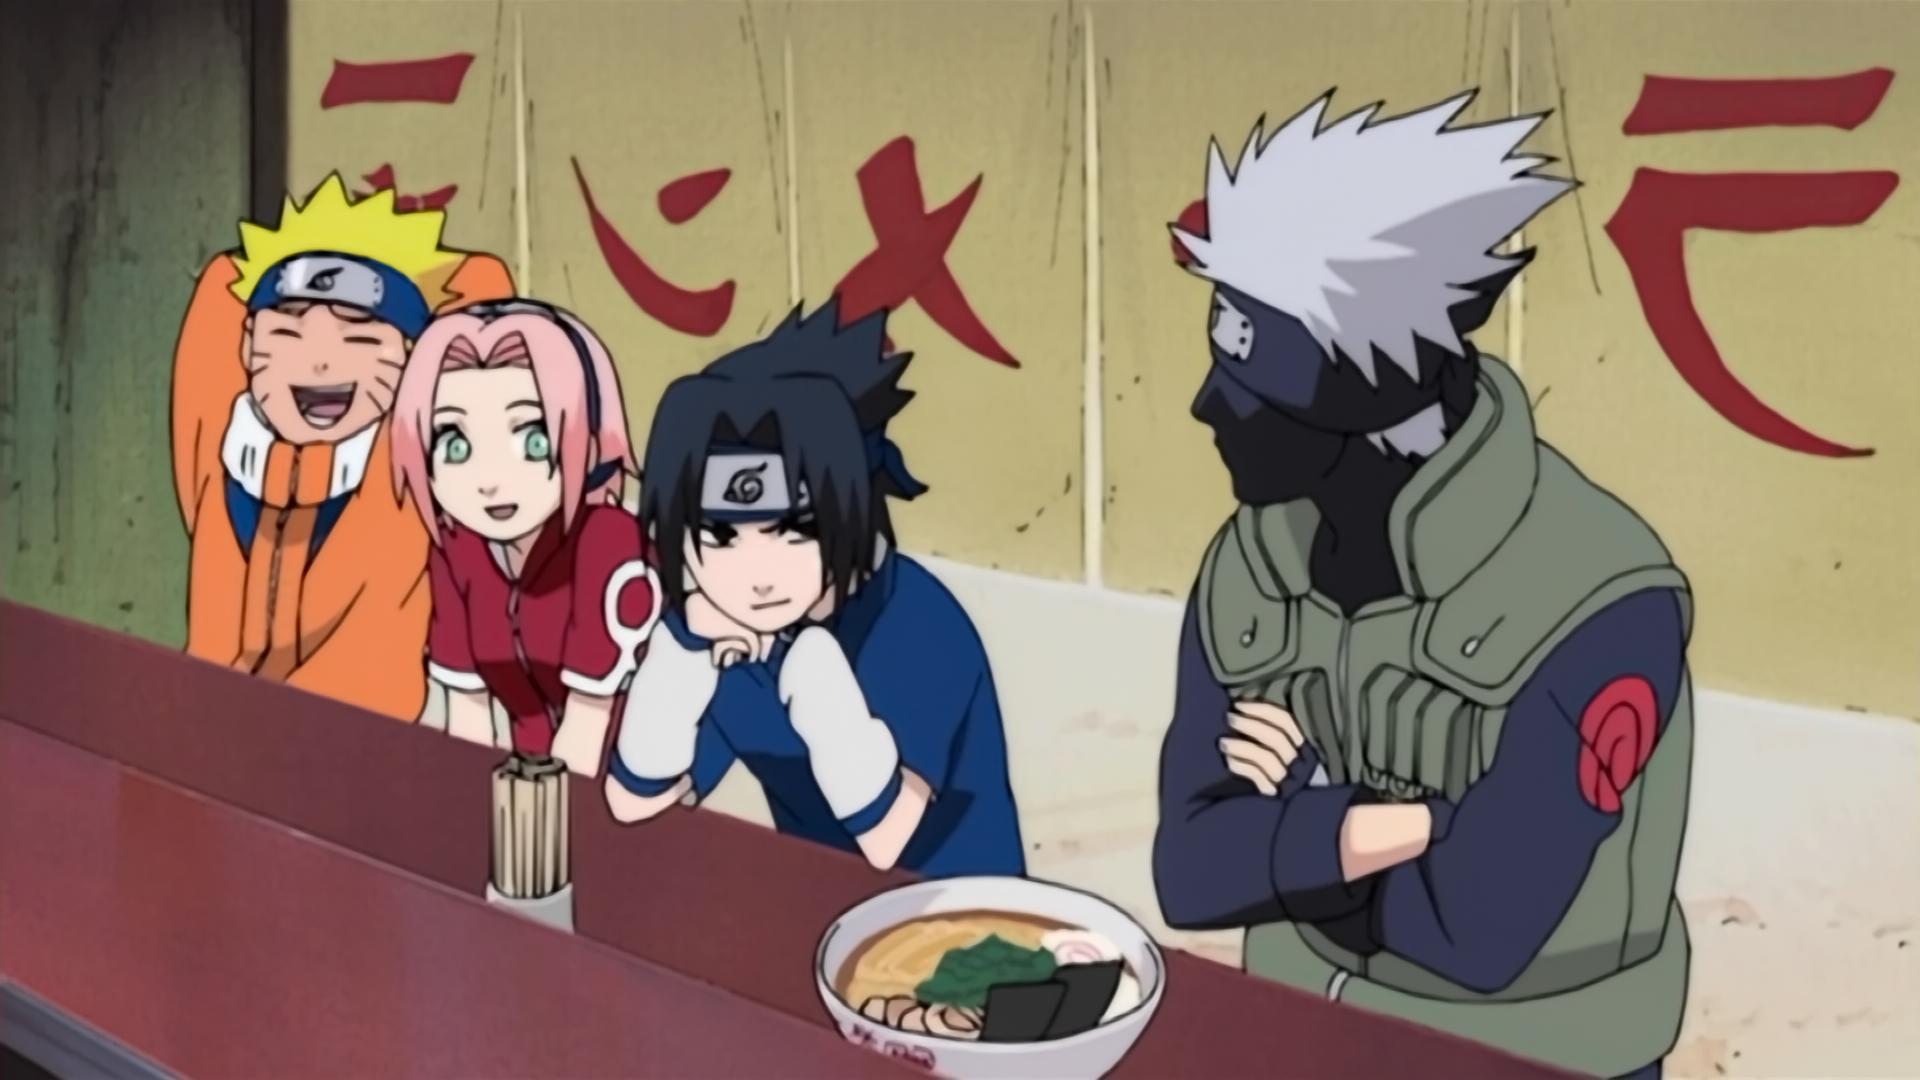 Naruto - S03E18 (101) Naruto Episode Fillers